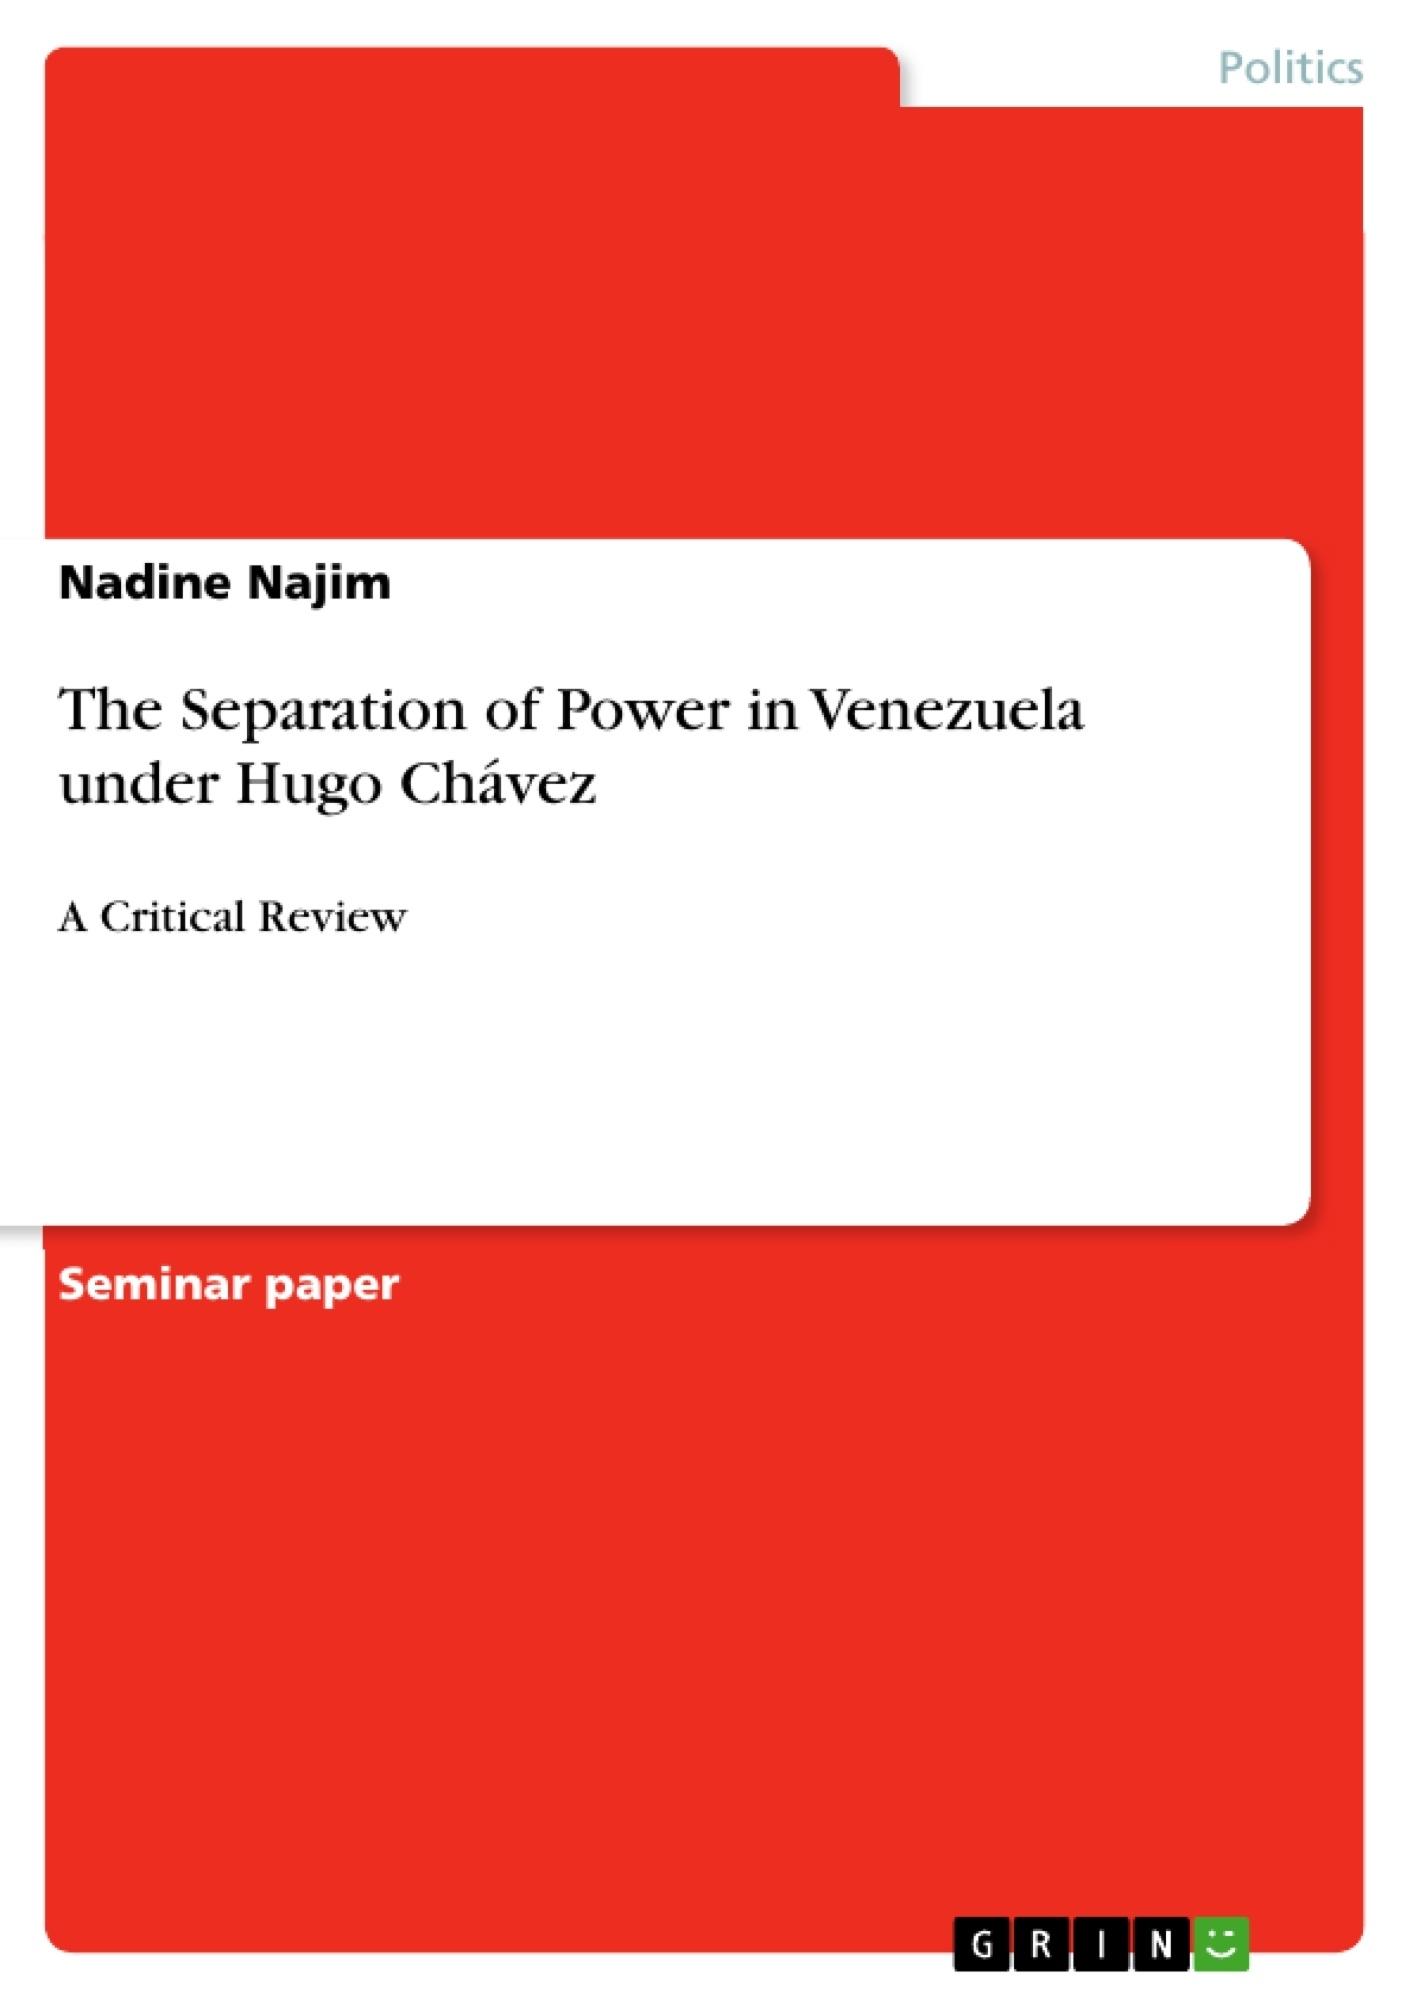 Title: The Separation of Power in Venezuela under Hugo Chávez